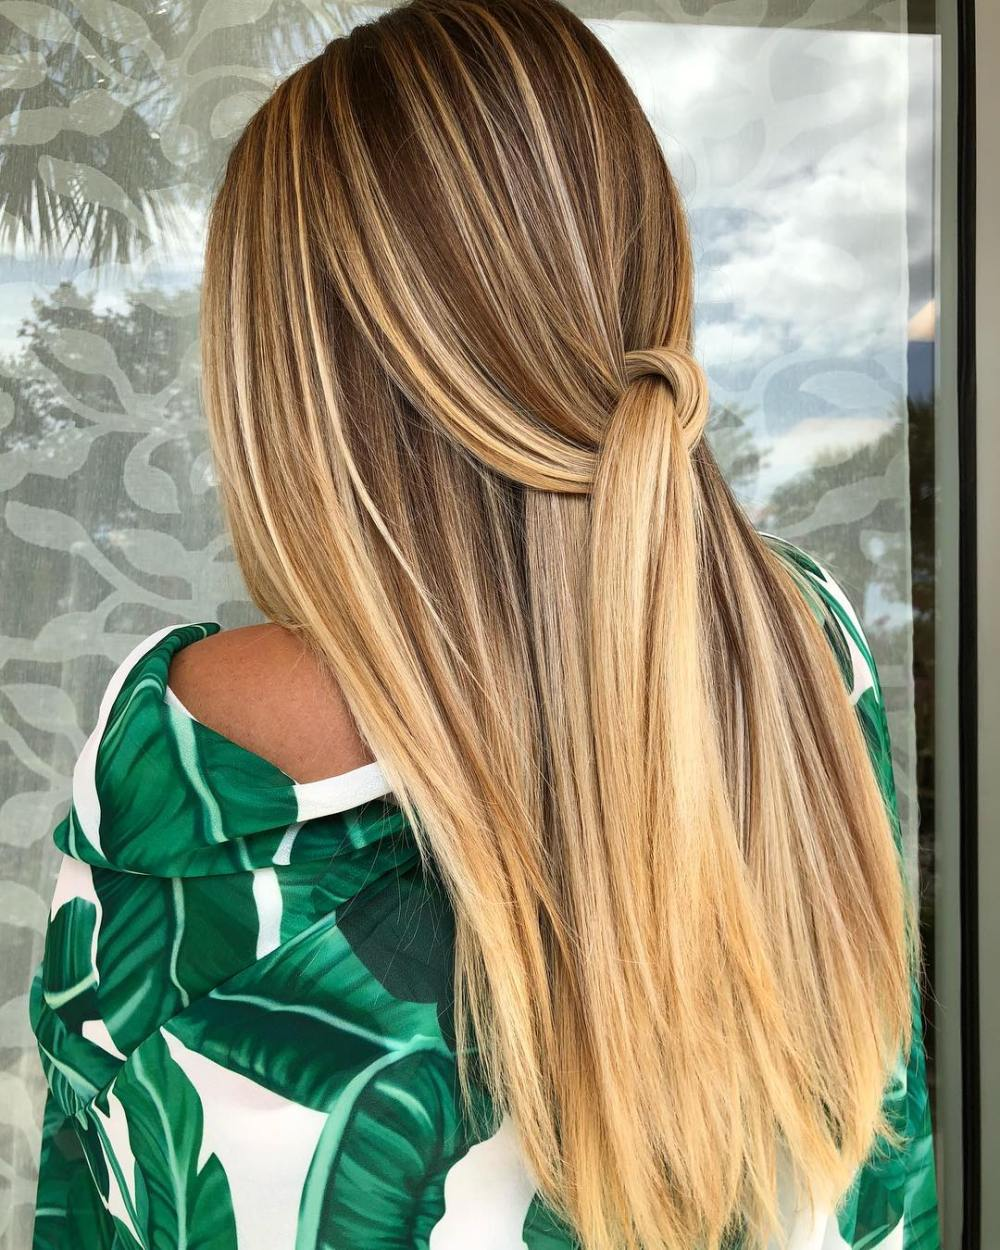 On Trending Honey Blonde Hair Colors 2019 ...